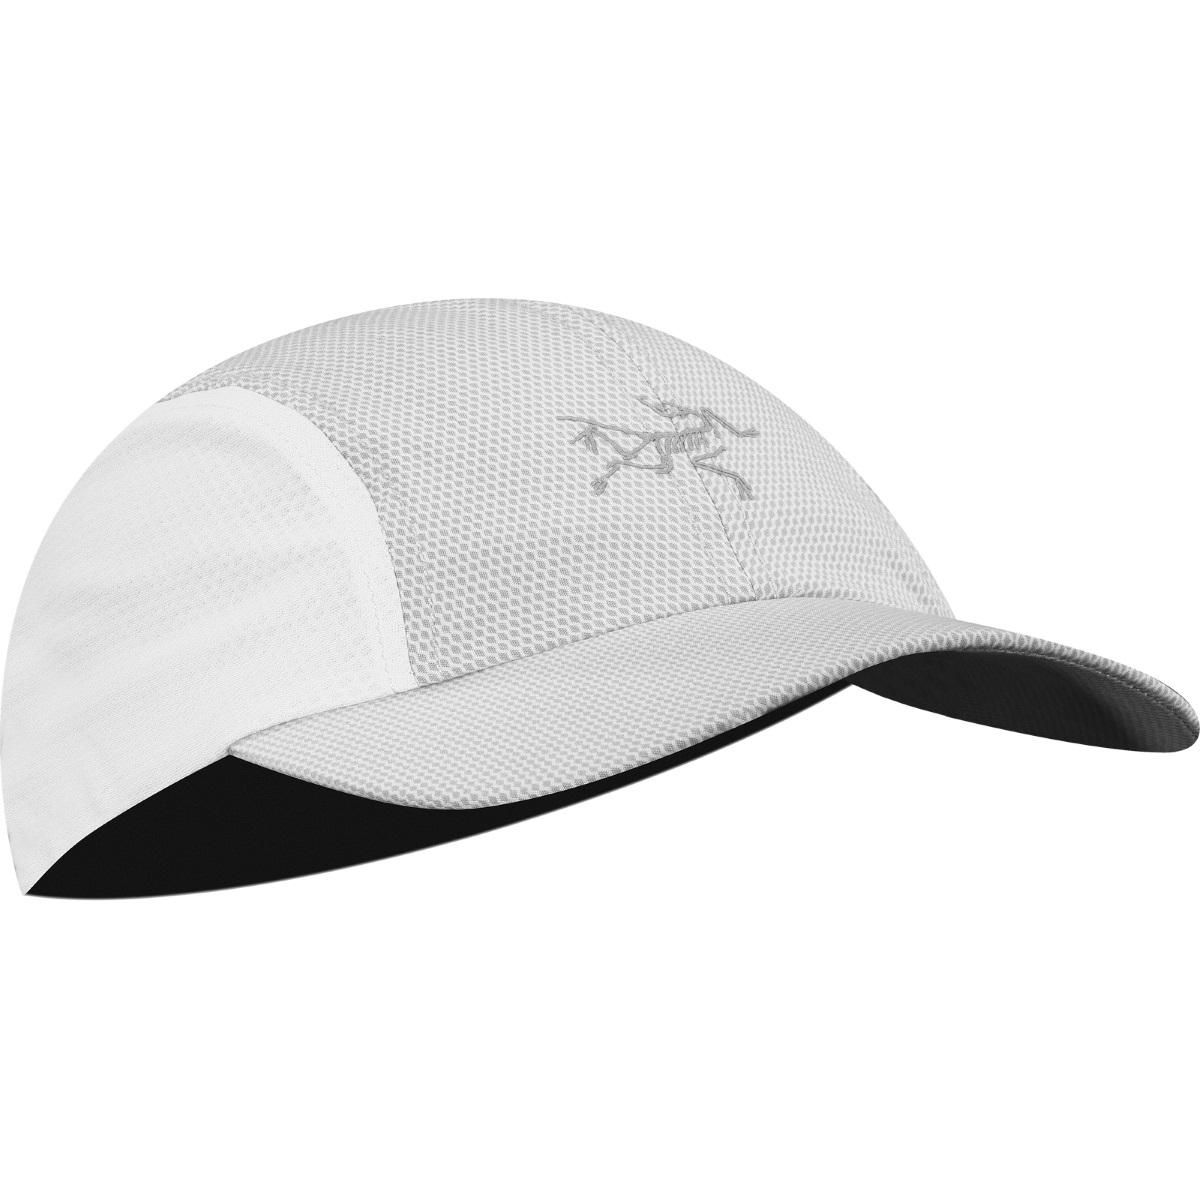 Arc Teryx Accelero Cap Head Gear Clothing